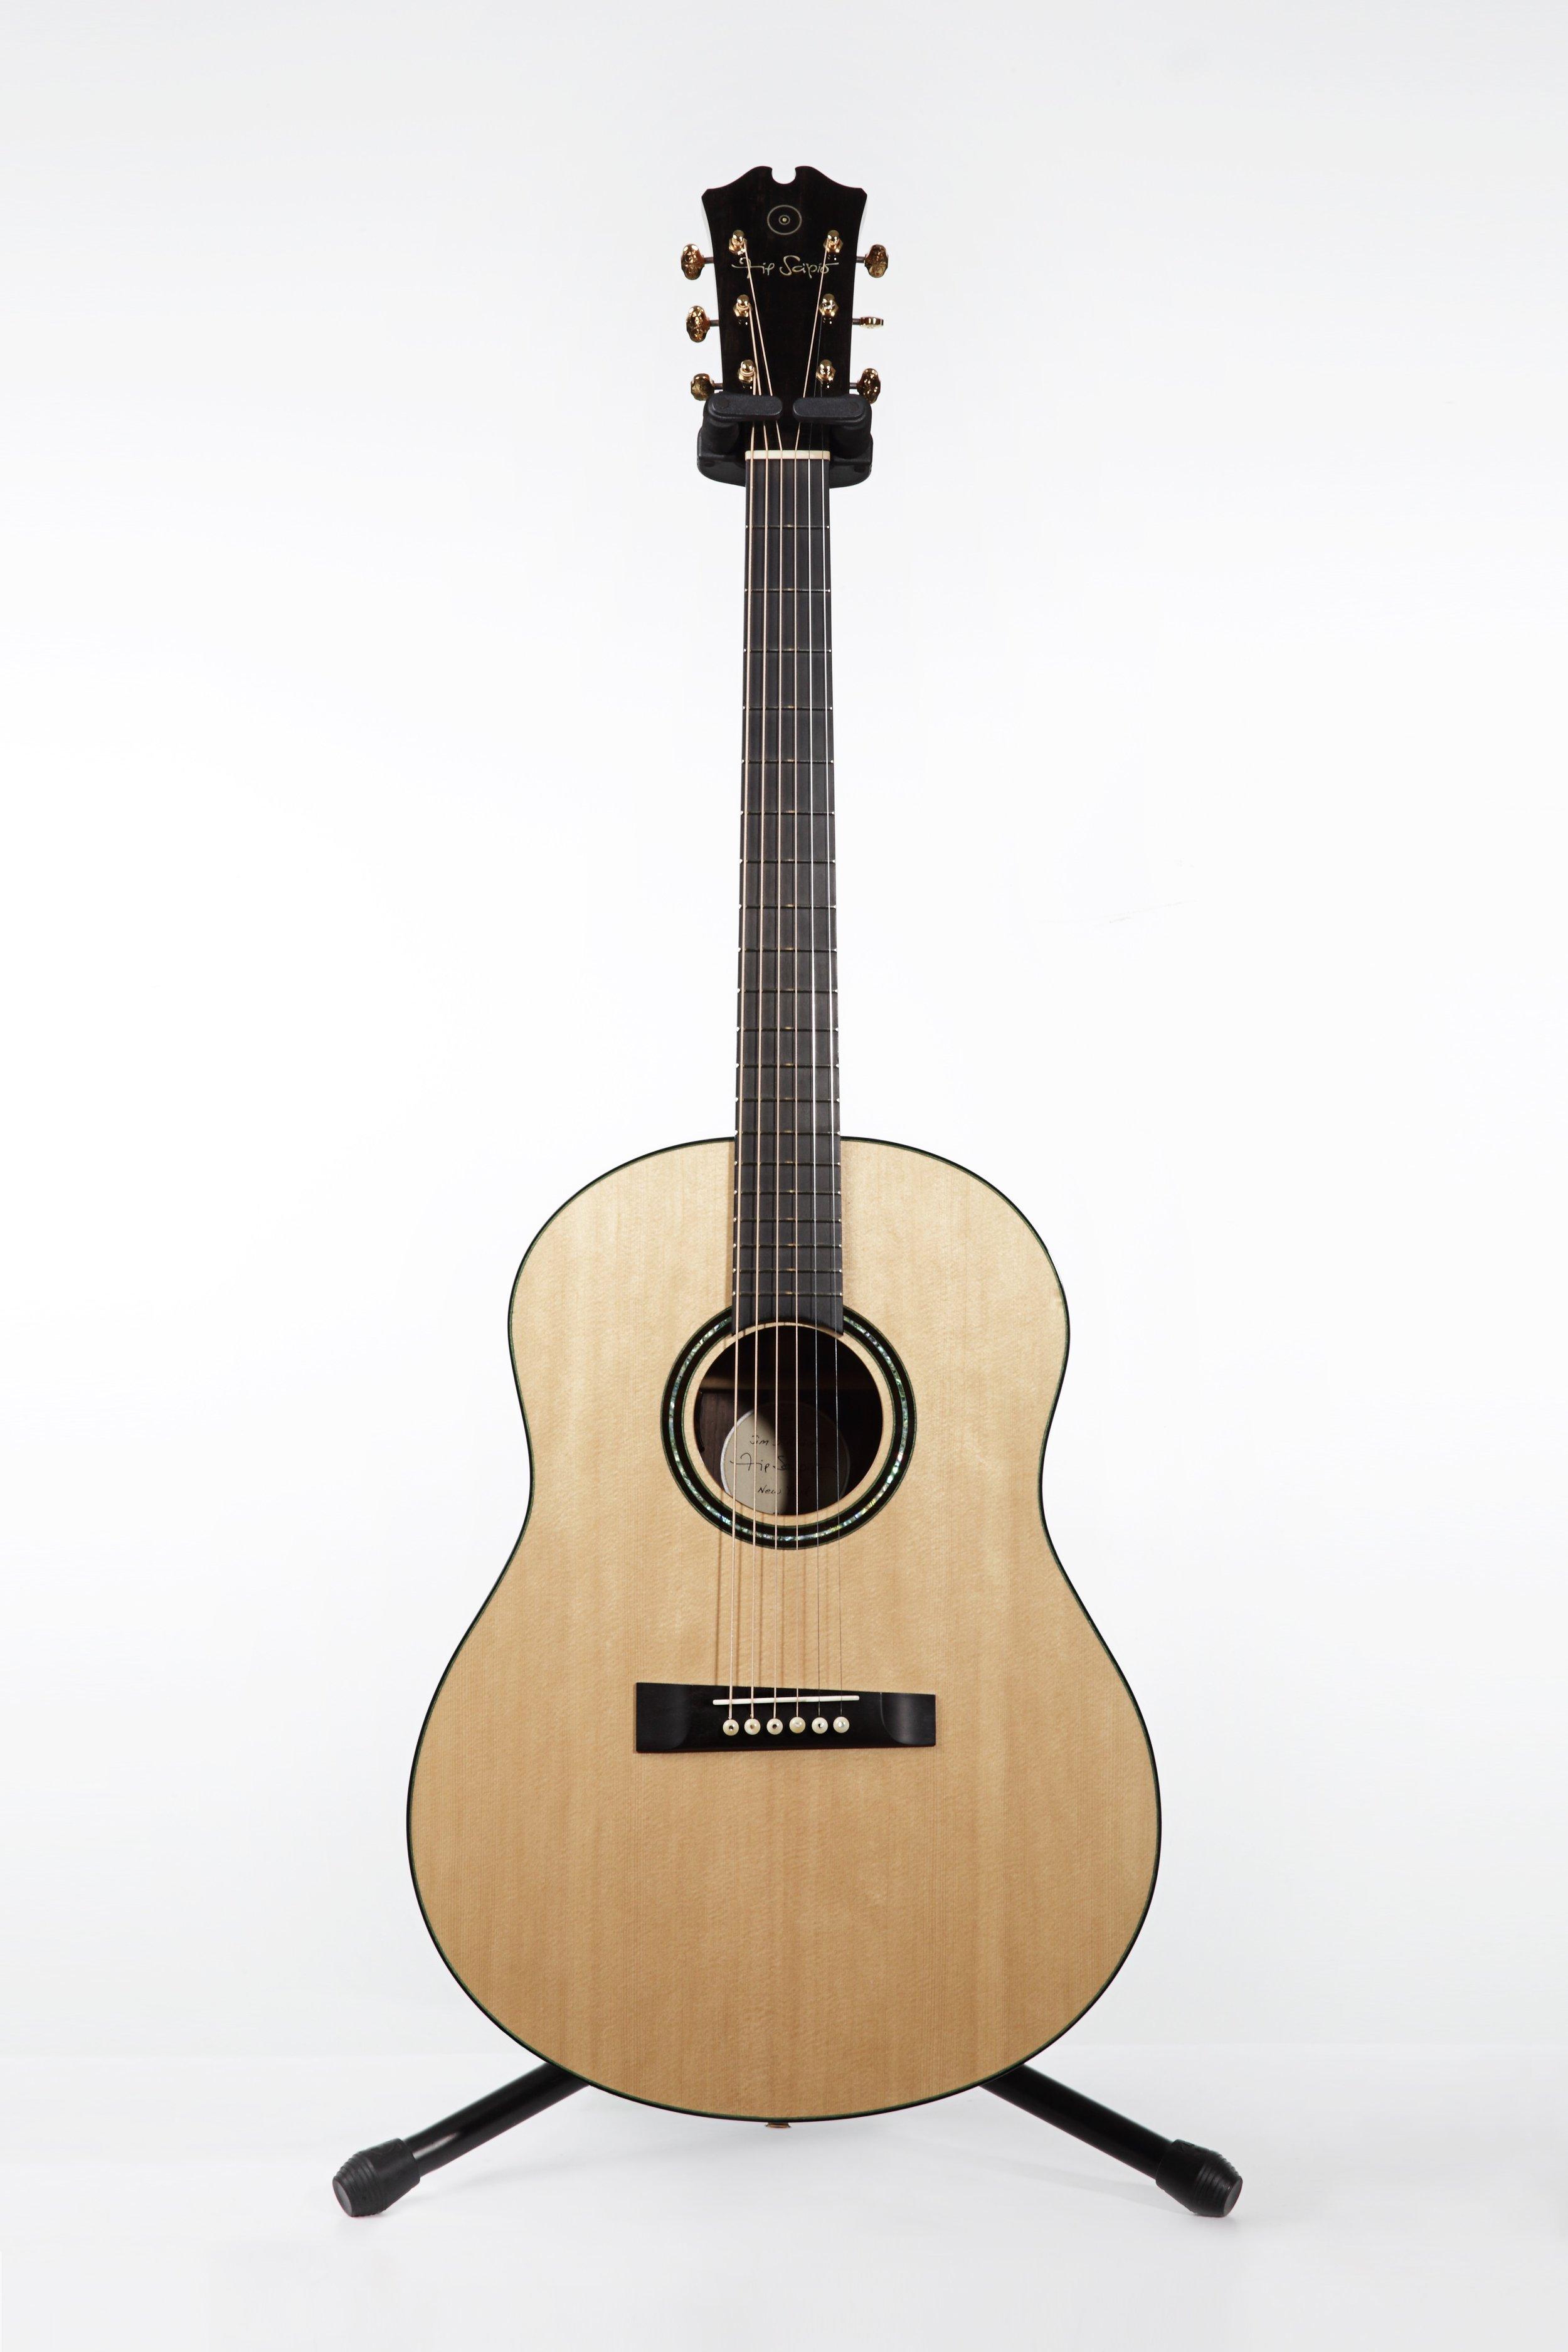 FScipio_2014 Acoustic Flattop Guitar Modeled after Michael Gurian Guitar_front.jpg